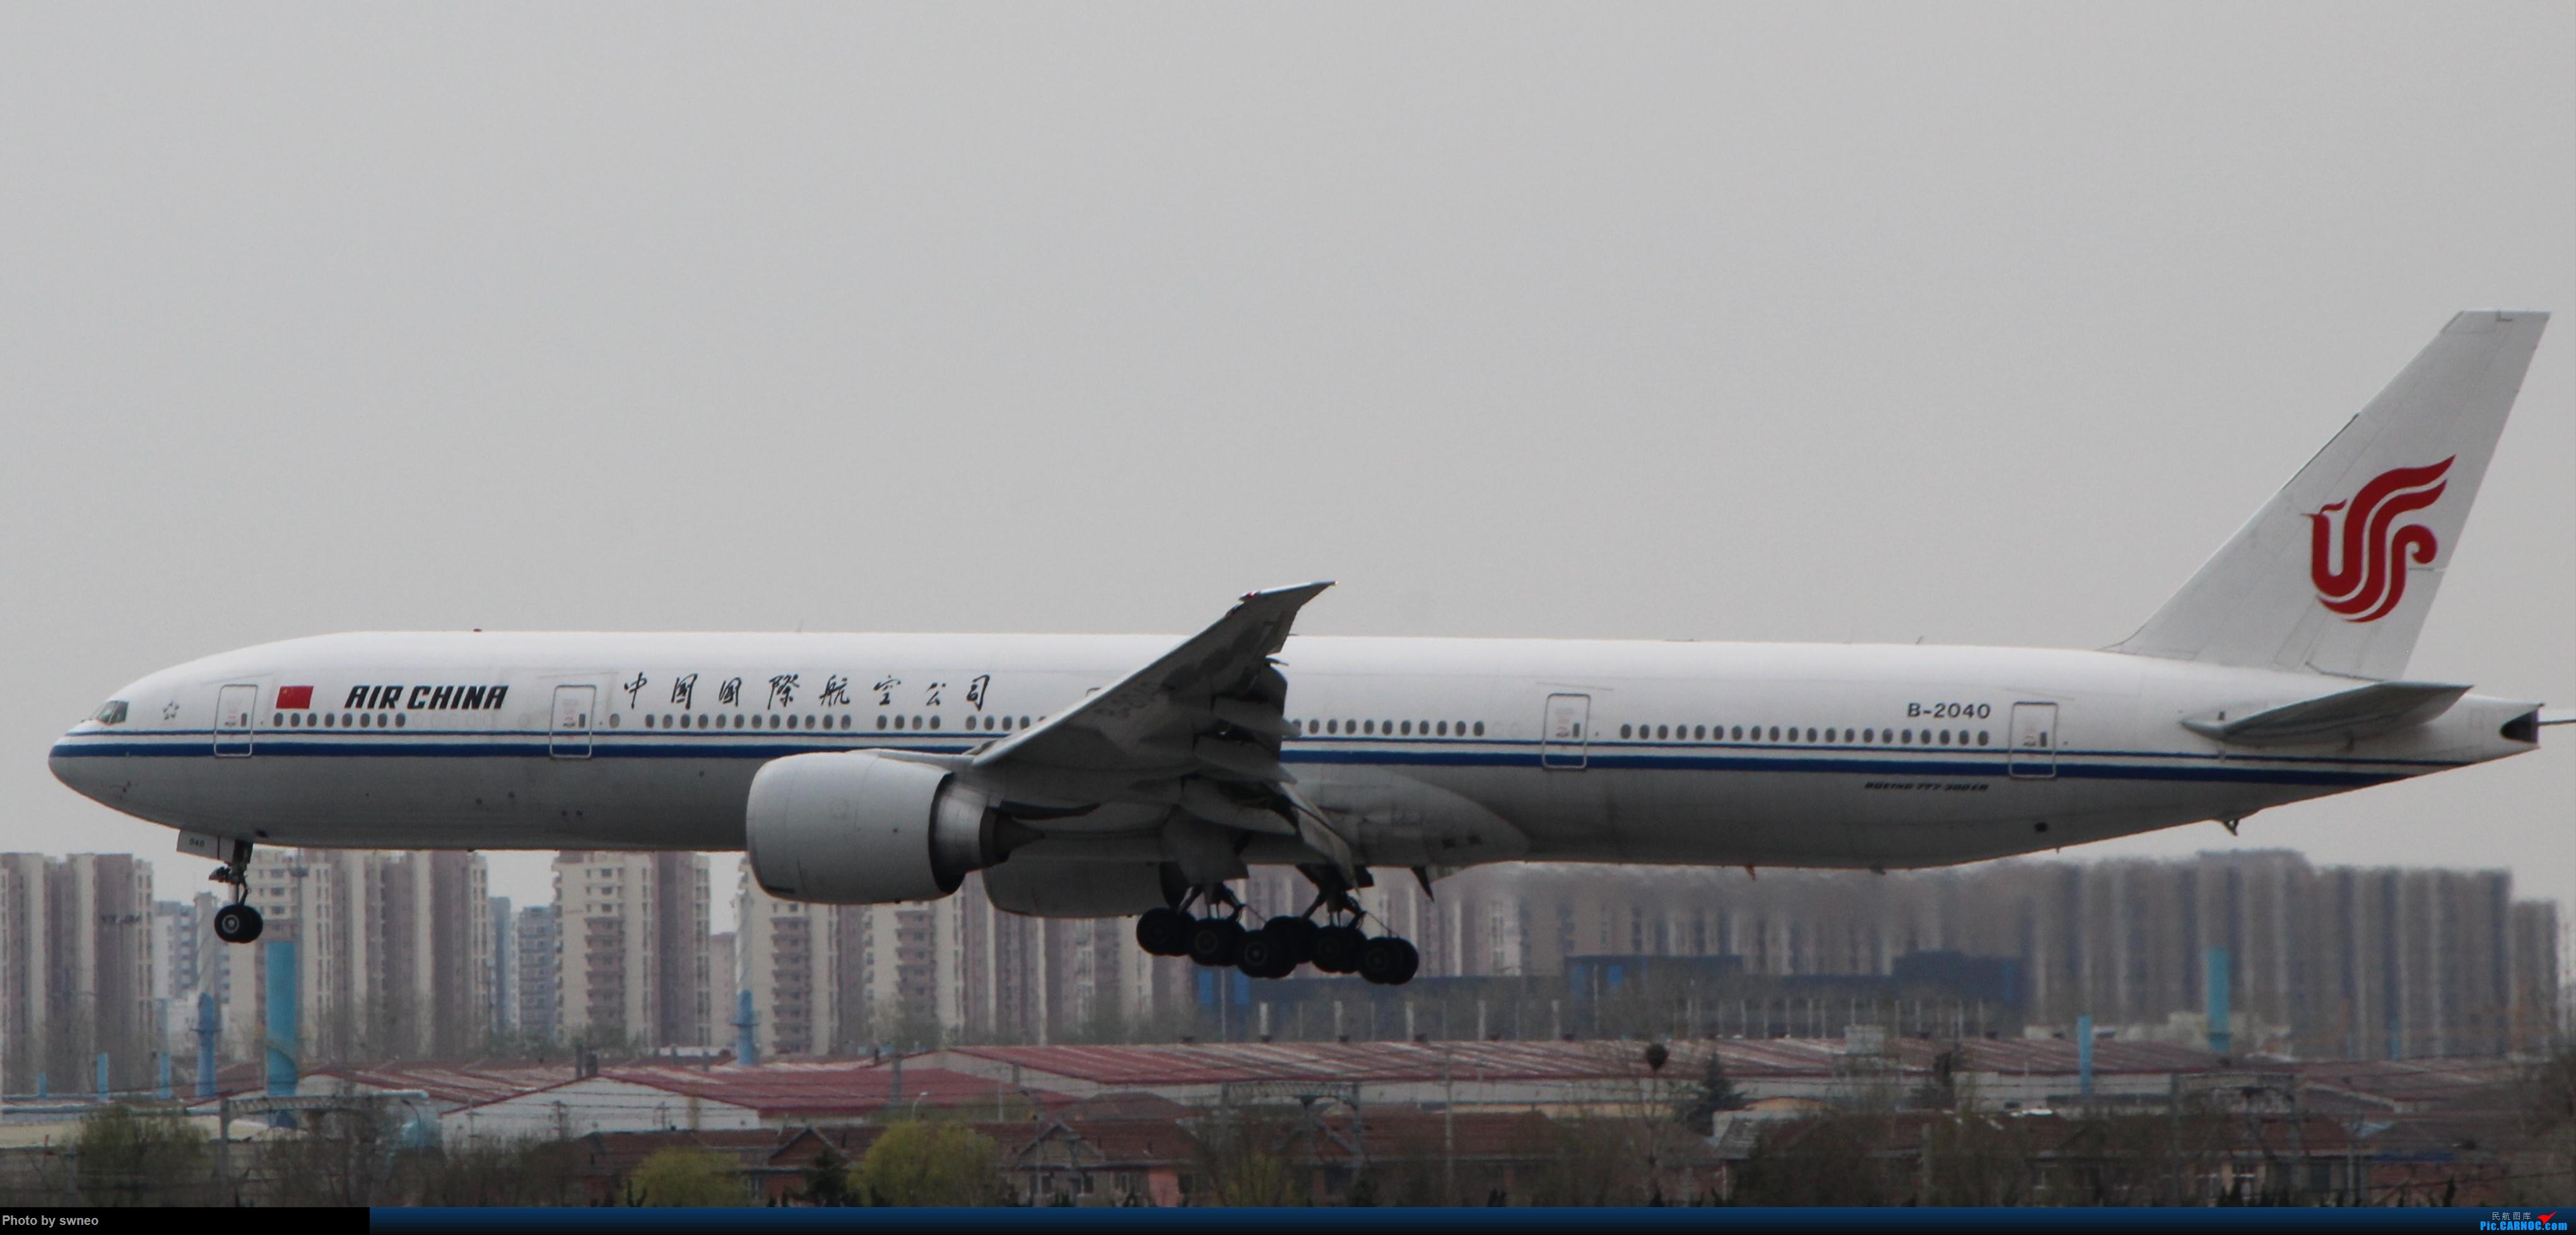 Re:青岛rw17土坡拍机 BOEING 777-300ER B-2040 中国青岛流亭国际机场